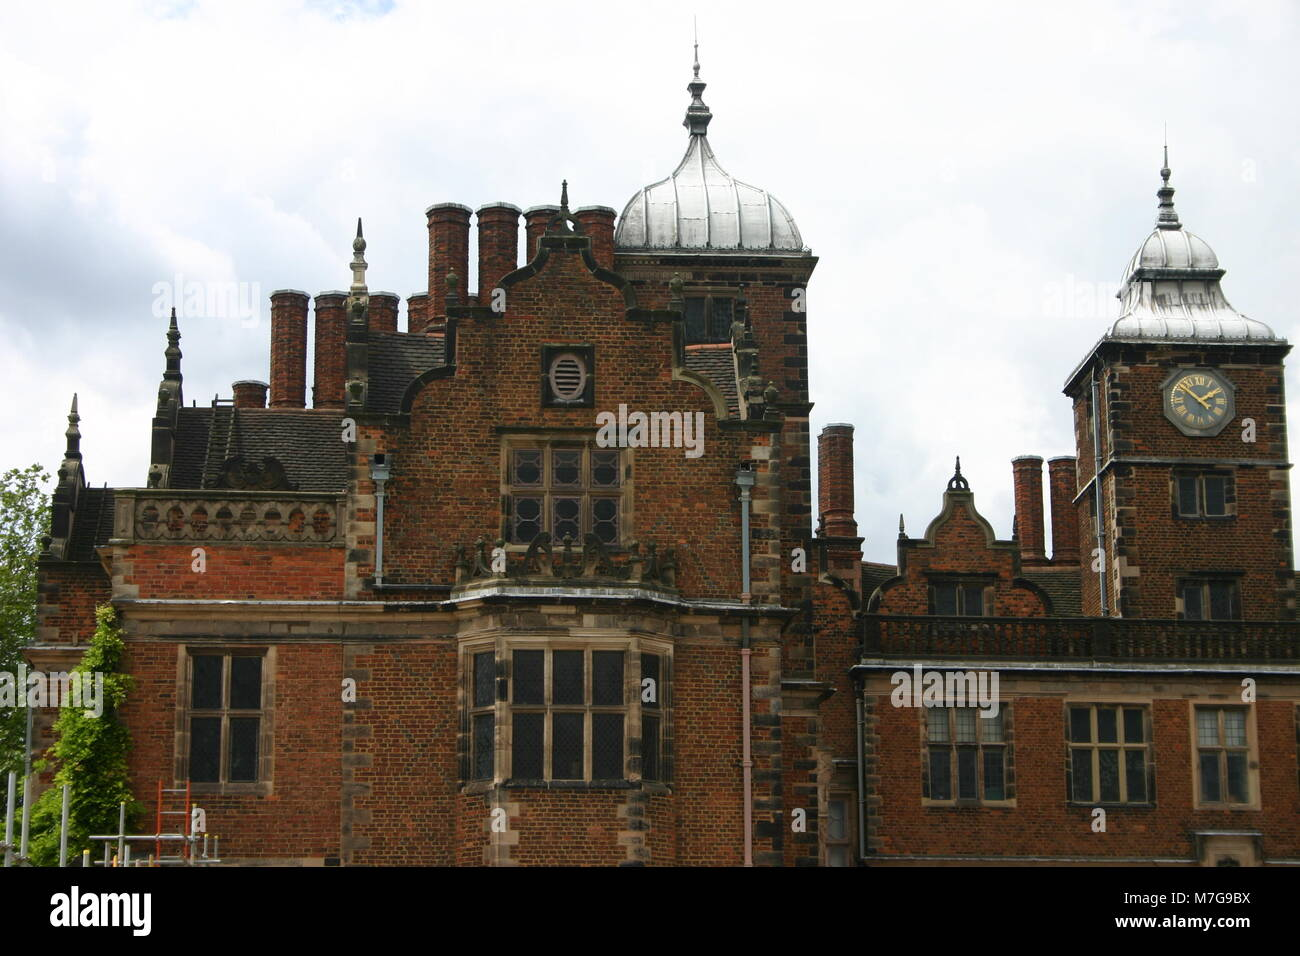 The front of Aston Hall, Birmingham, Jacobean manor house, built 1618 - Stock Image